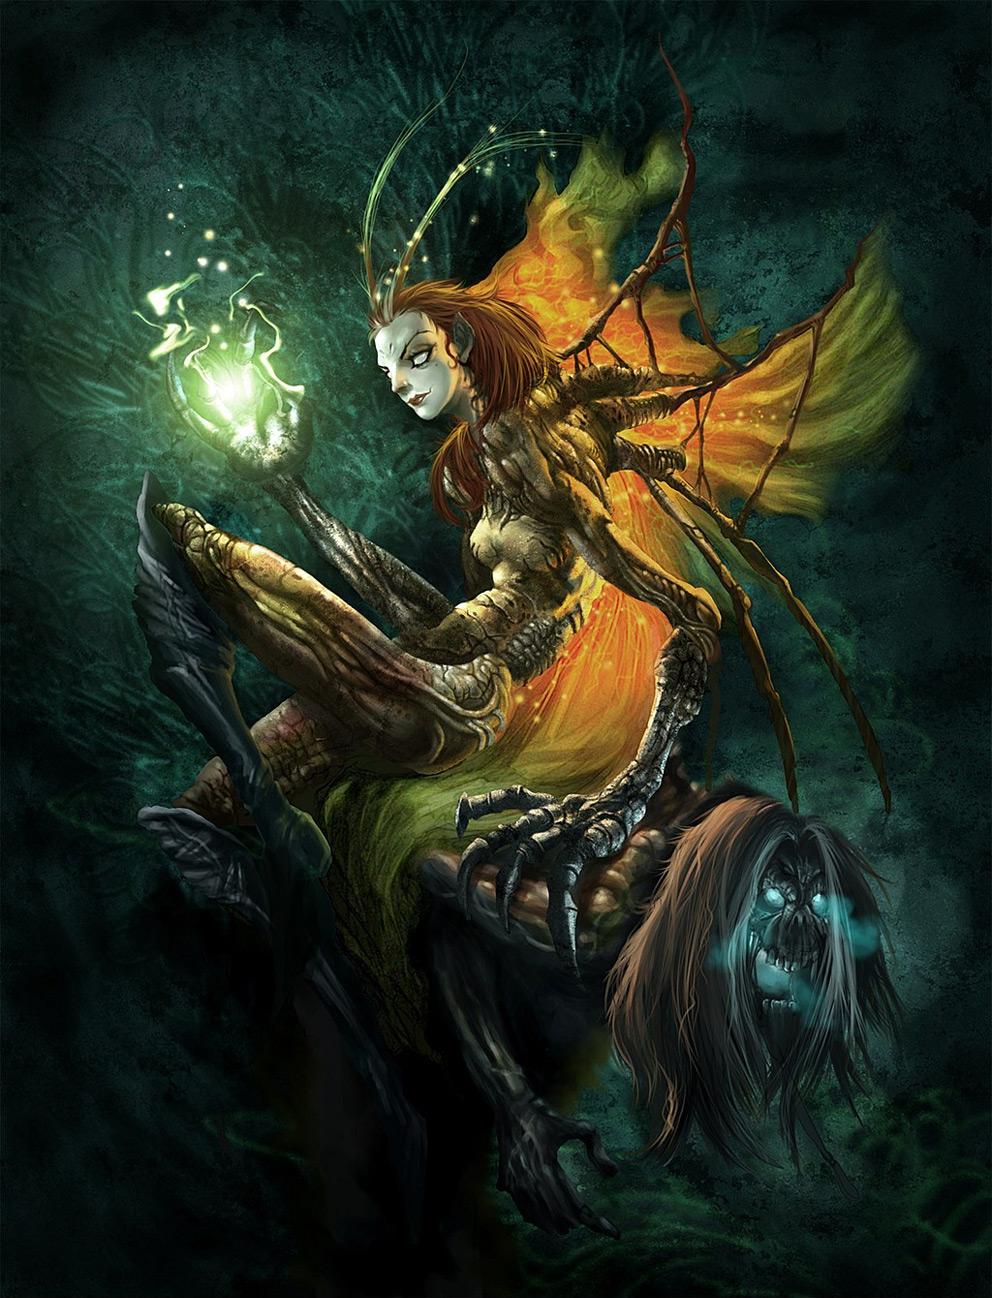 Fantasy Art Mantis Queen 2d Digital Concept Art Fantasycoolvibe Digital Art